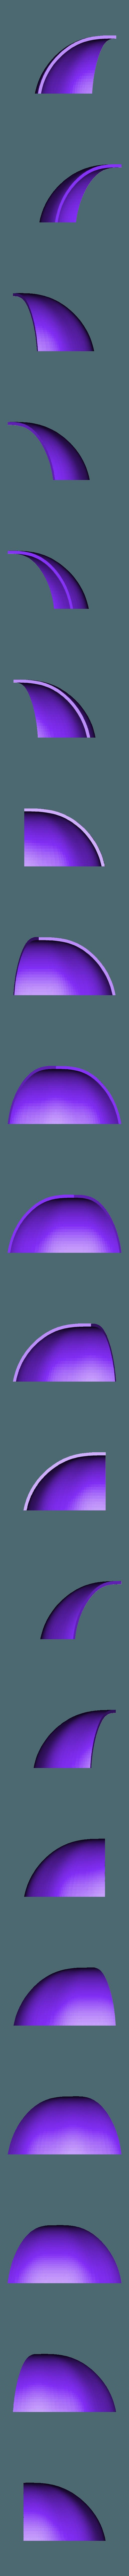 Higher Left Back Head Fixed.stl Download free STL file 3D Printable Helmet • Object to 3D print, Logtrimmer